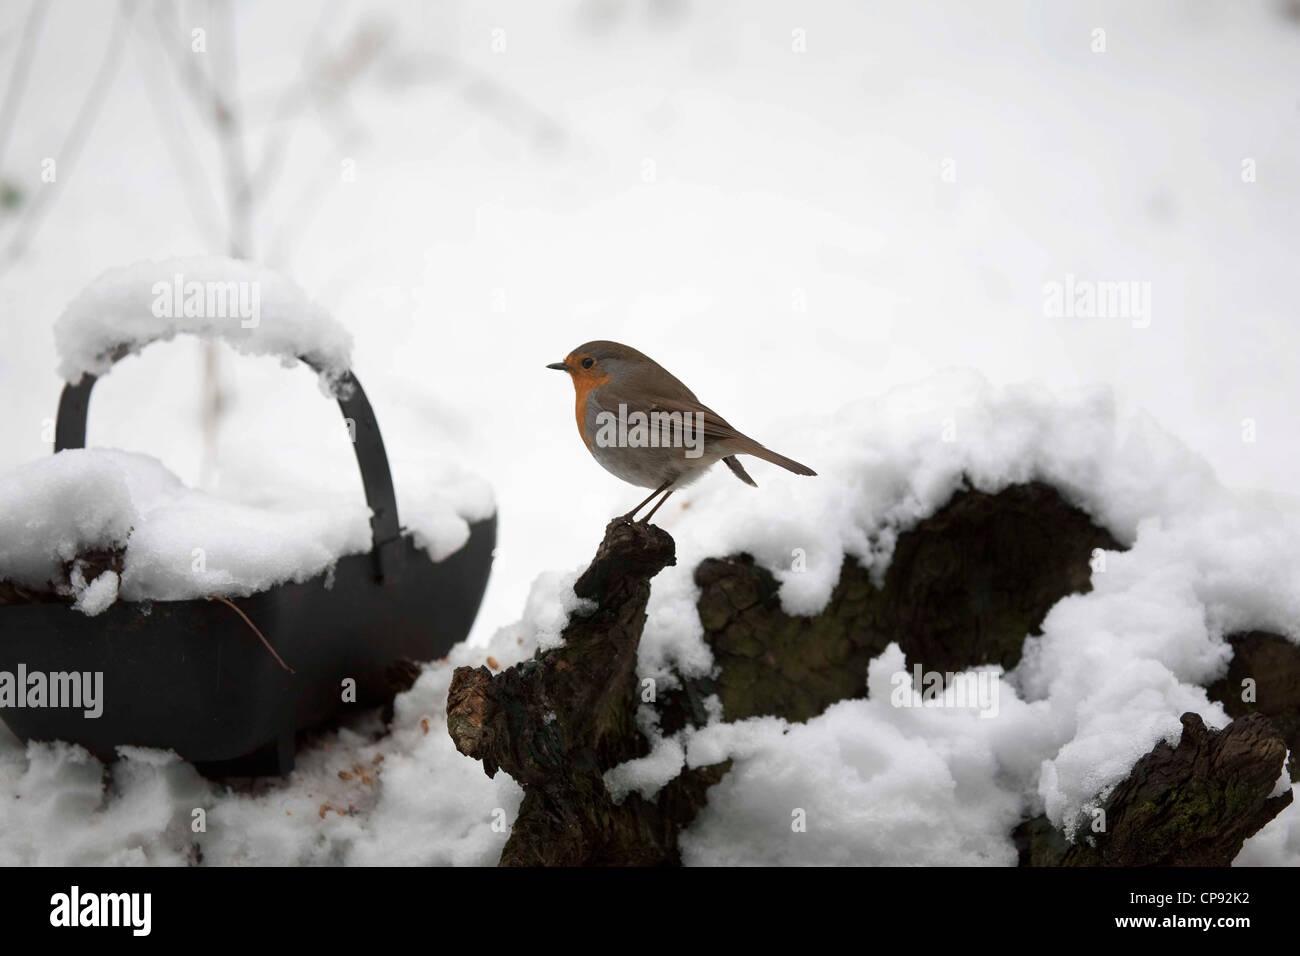 European Robin in snow - Stock Image